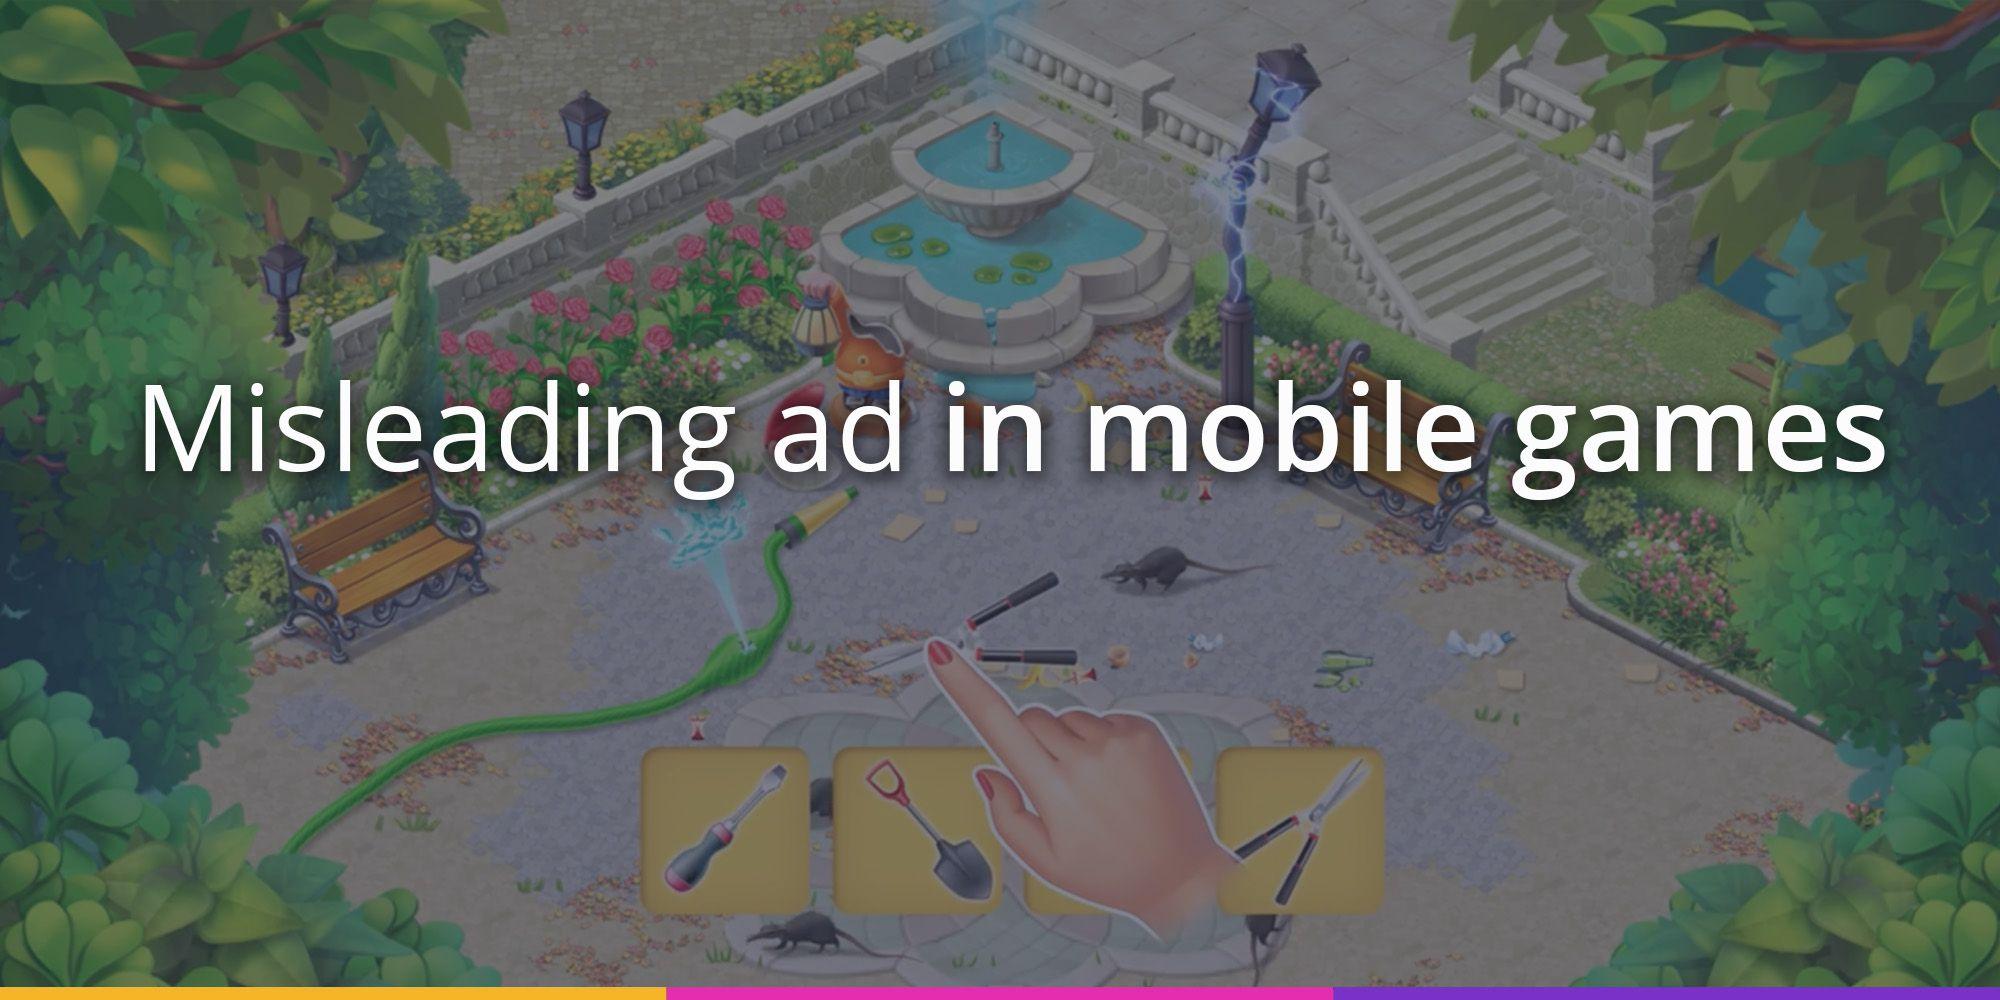 Misleading ad in mobile games: Playrix, Matchington Mansion, Mafia City